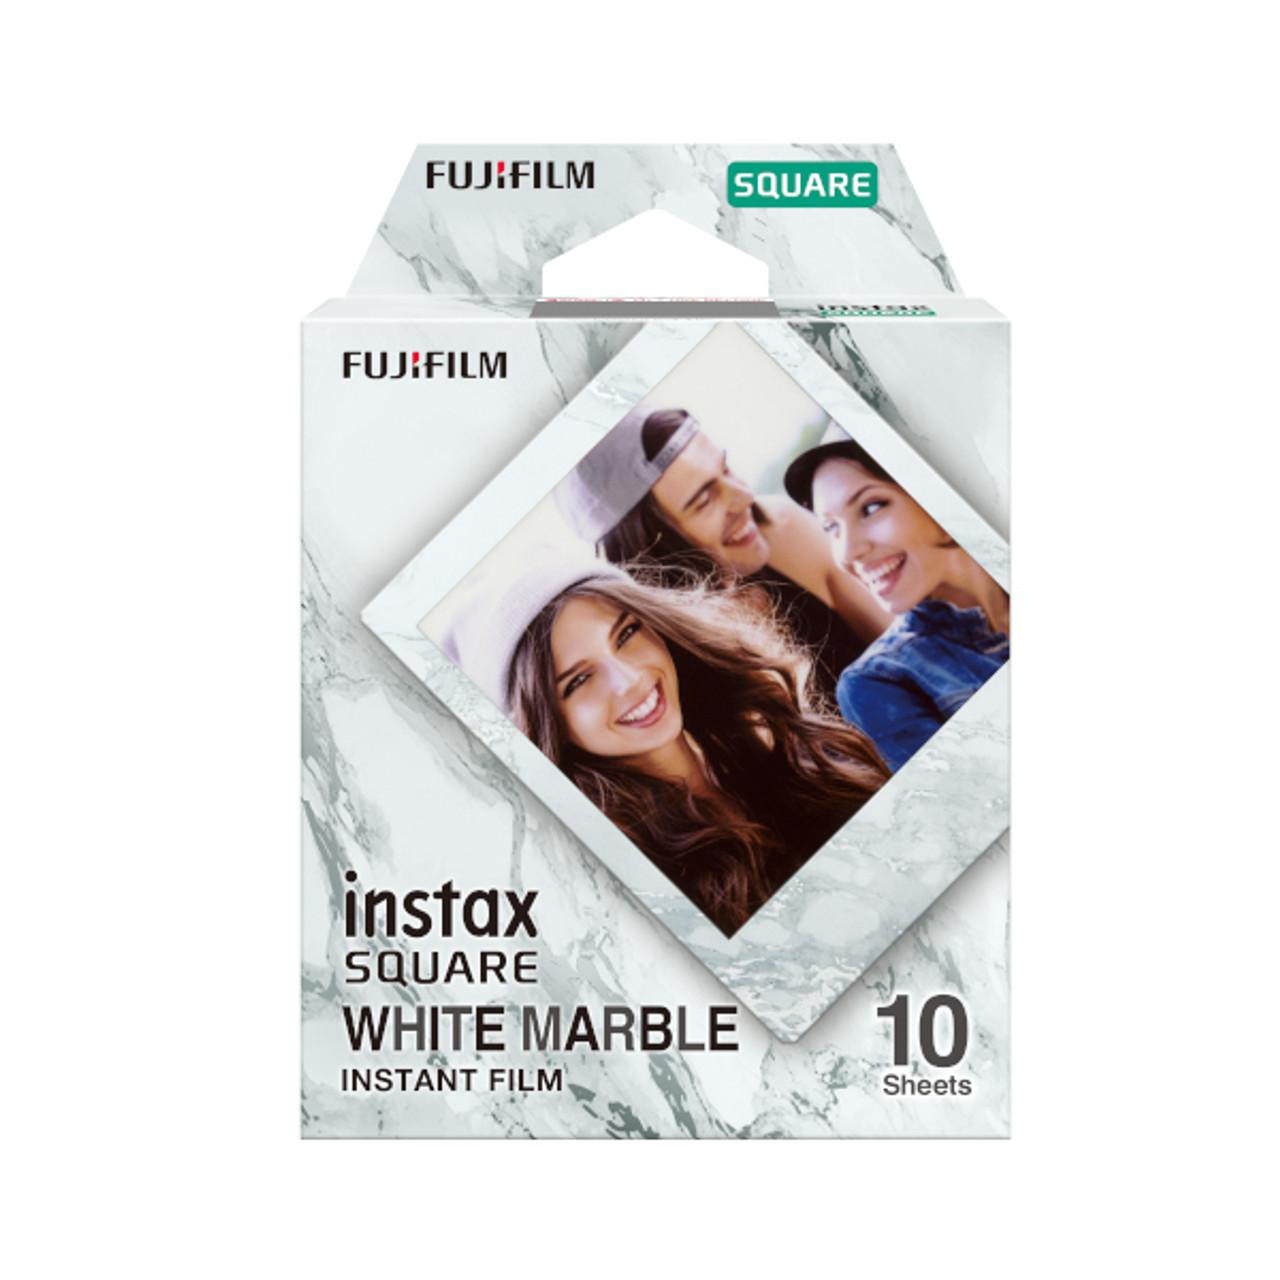 Fujifilm Instax Square Film - 10 EXP (White Marble)